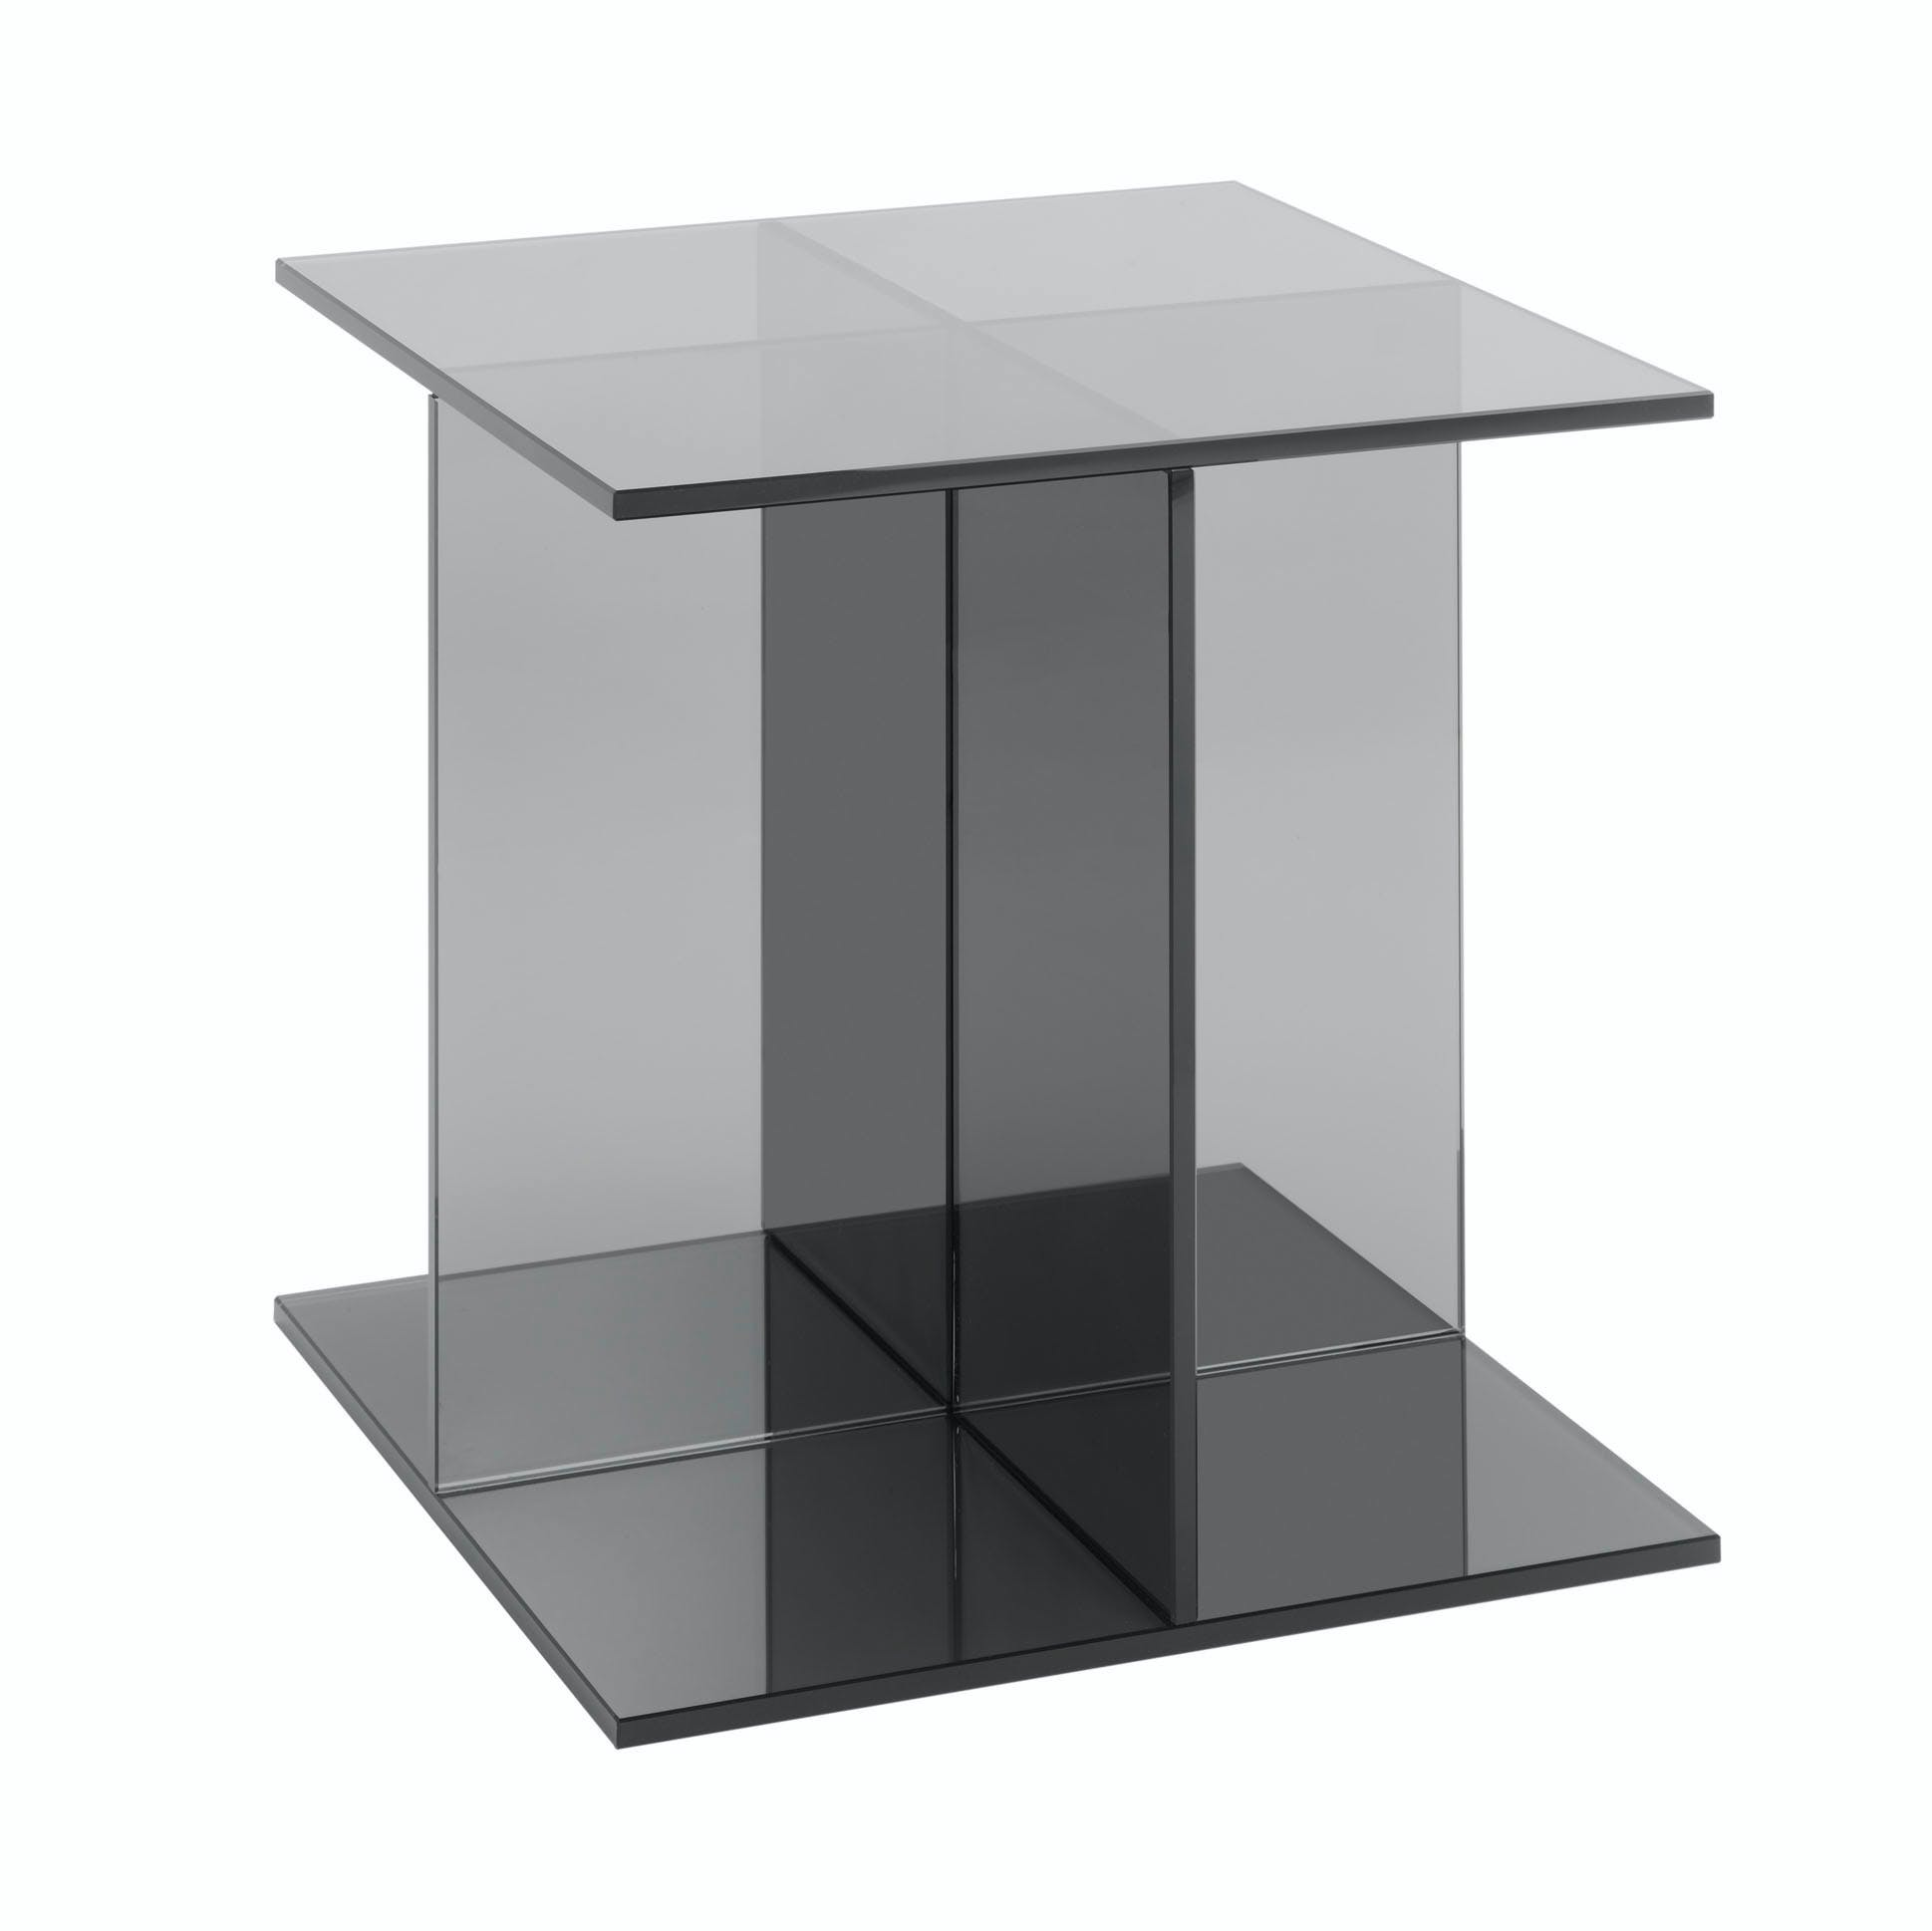 E15-furniture-vier-side-table-black-solo-thumb-haute-living